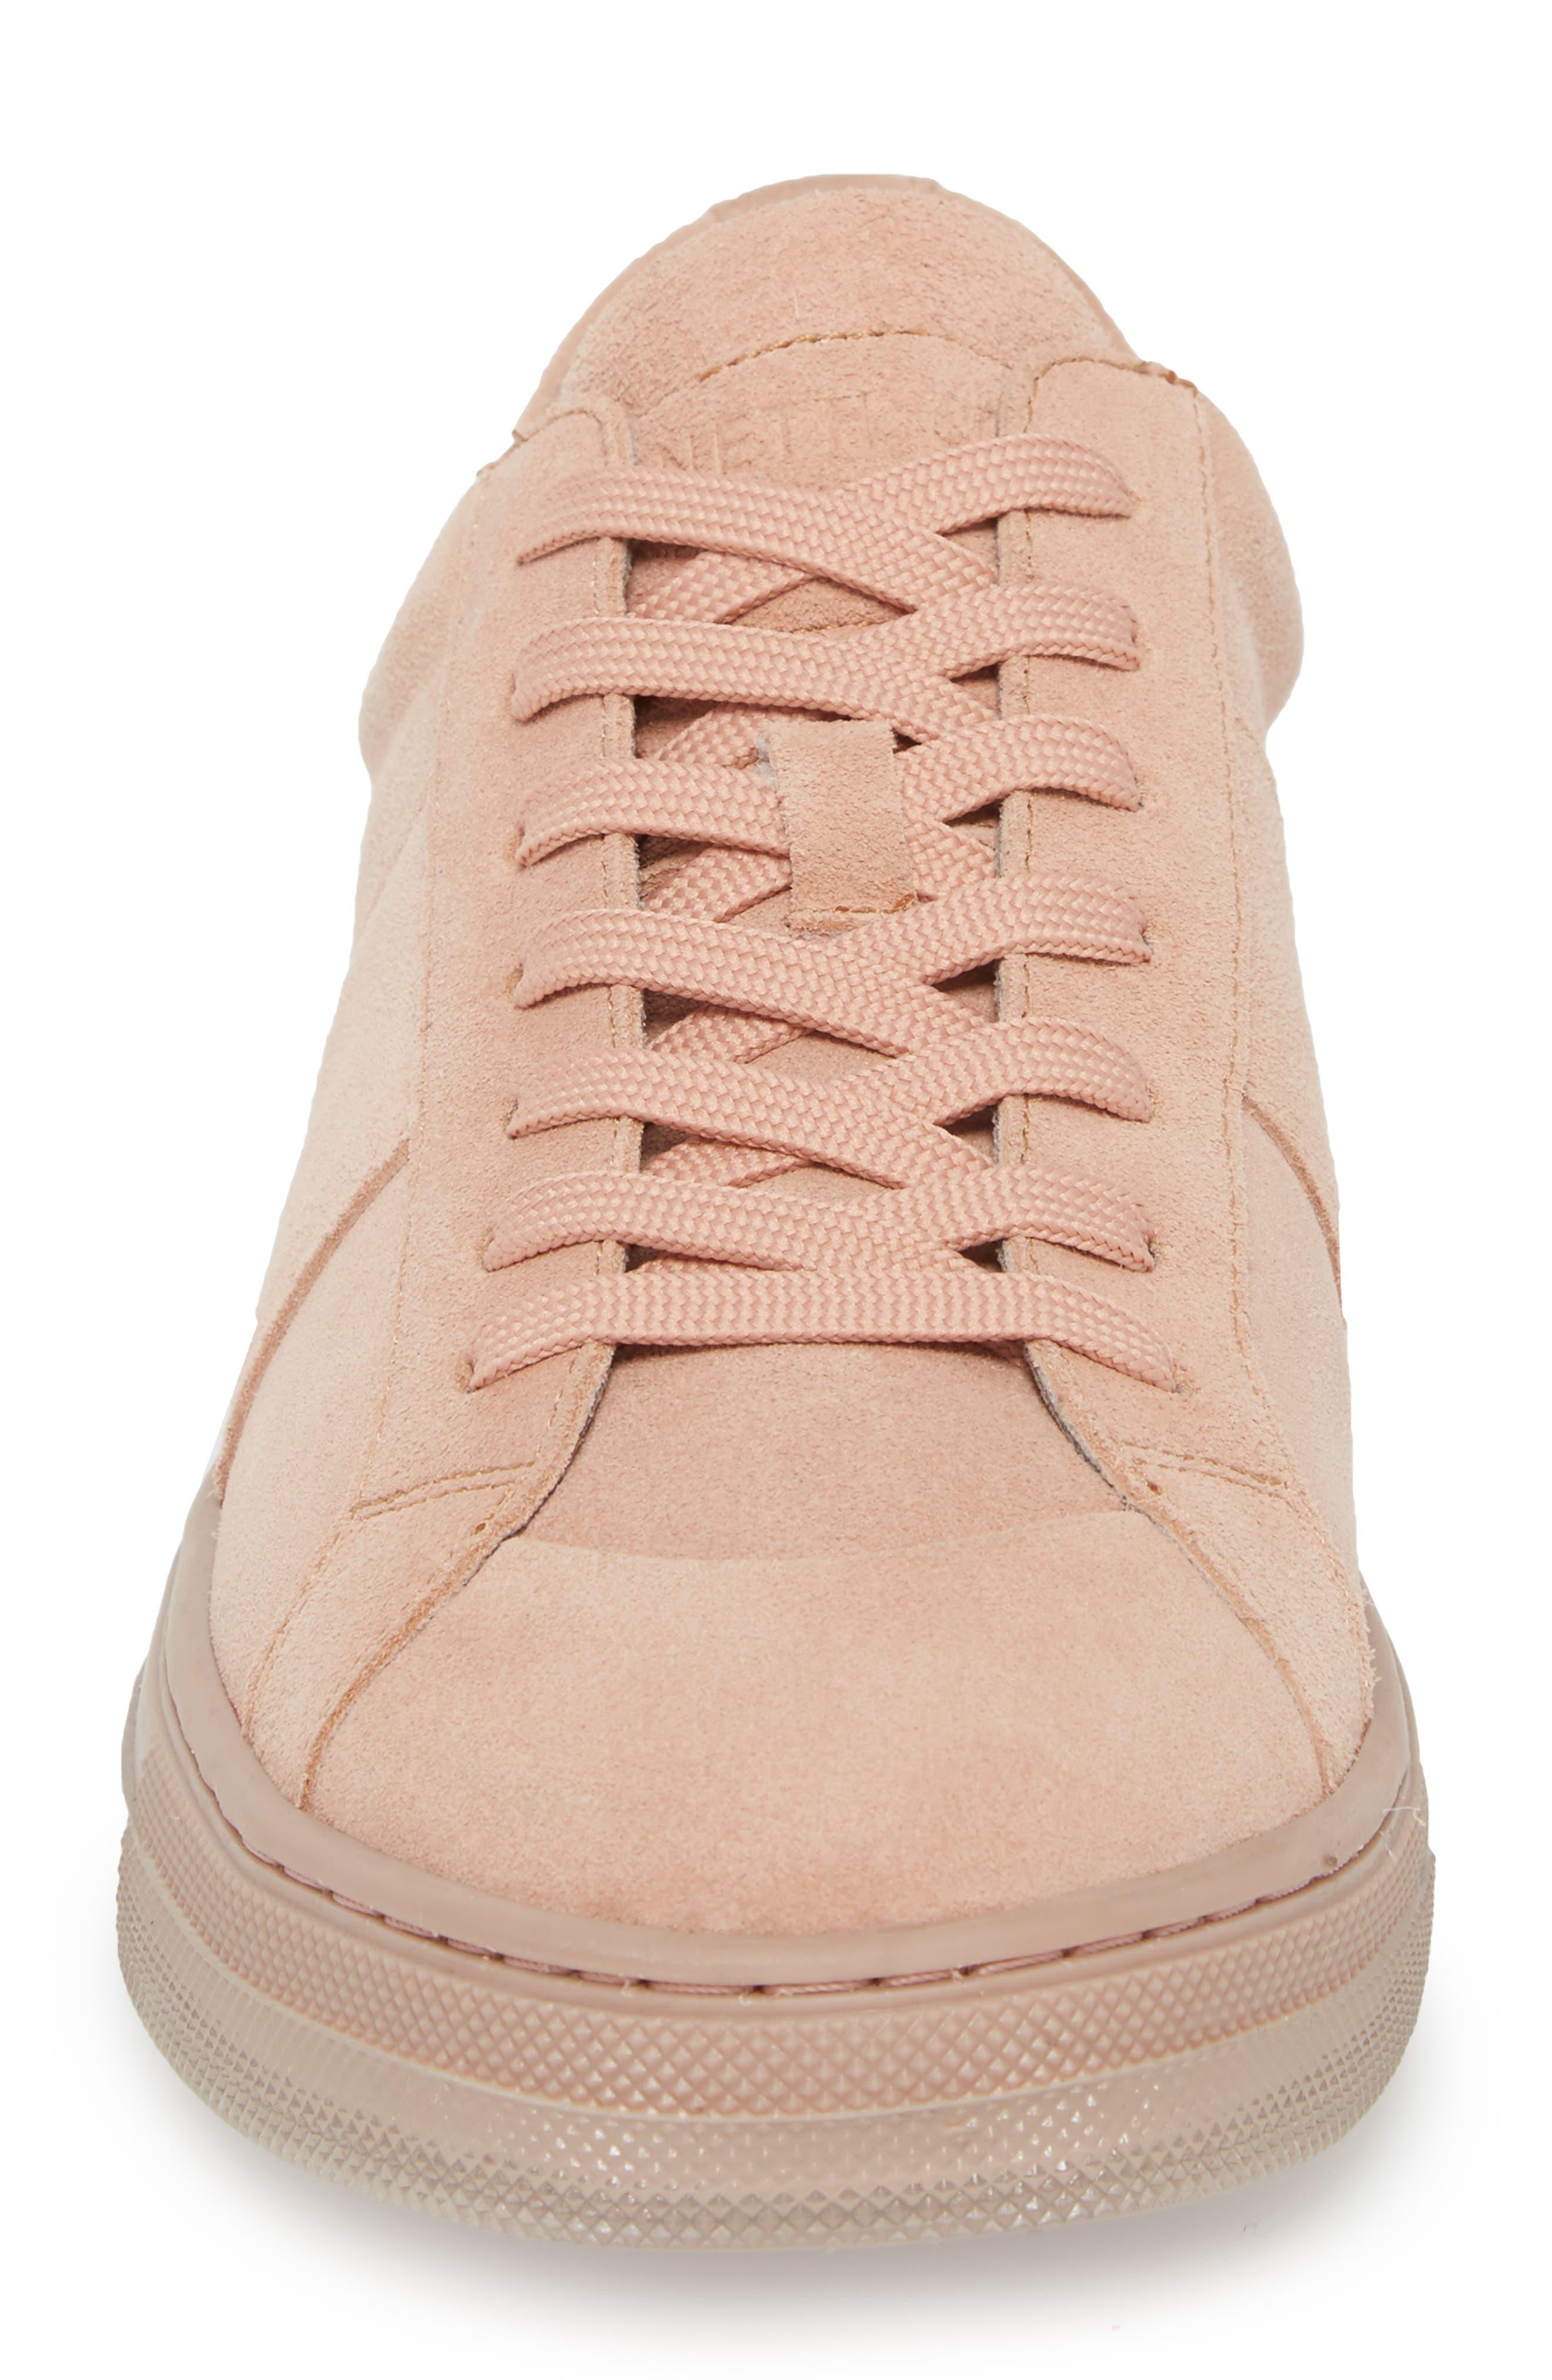 Colvin Sneaker,                             Alternate thumbnail 4, color,                             Rose Suede